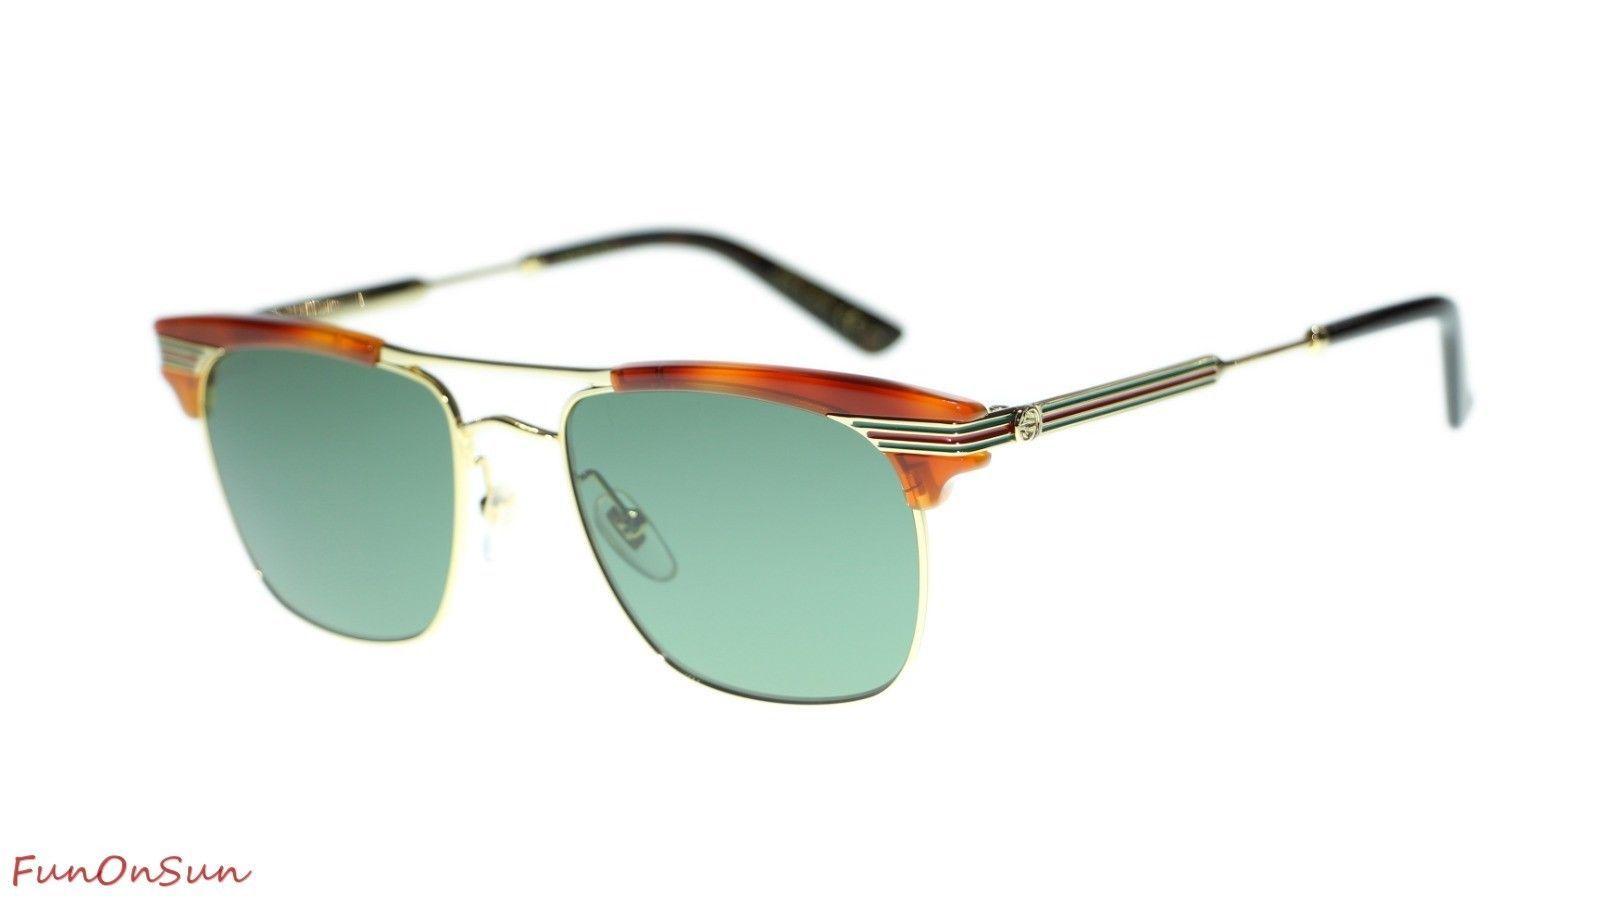 0f69de7245d11 10. 10. Previous. Gucci Men Sunglasses GG0287S 004 Havana Gold Green Lens  Square 52mm Authentic